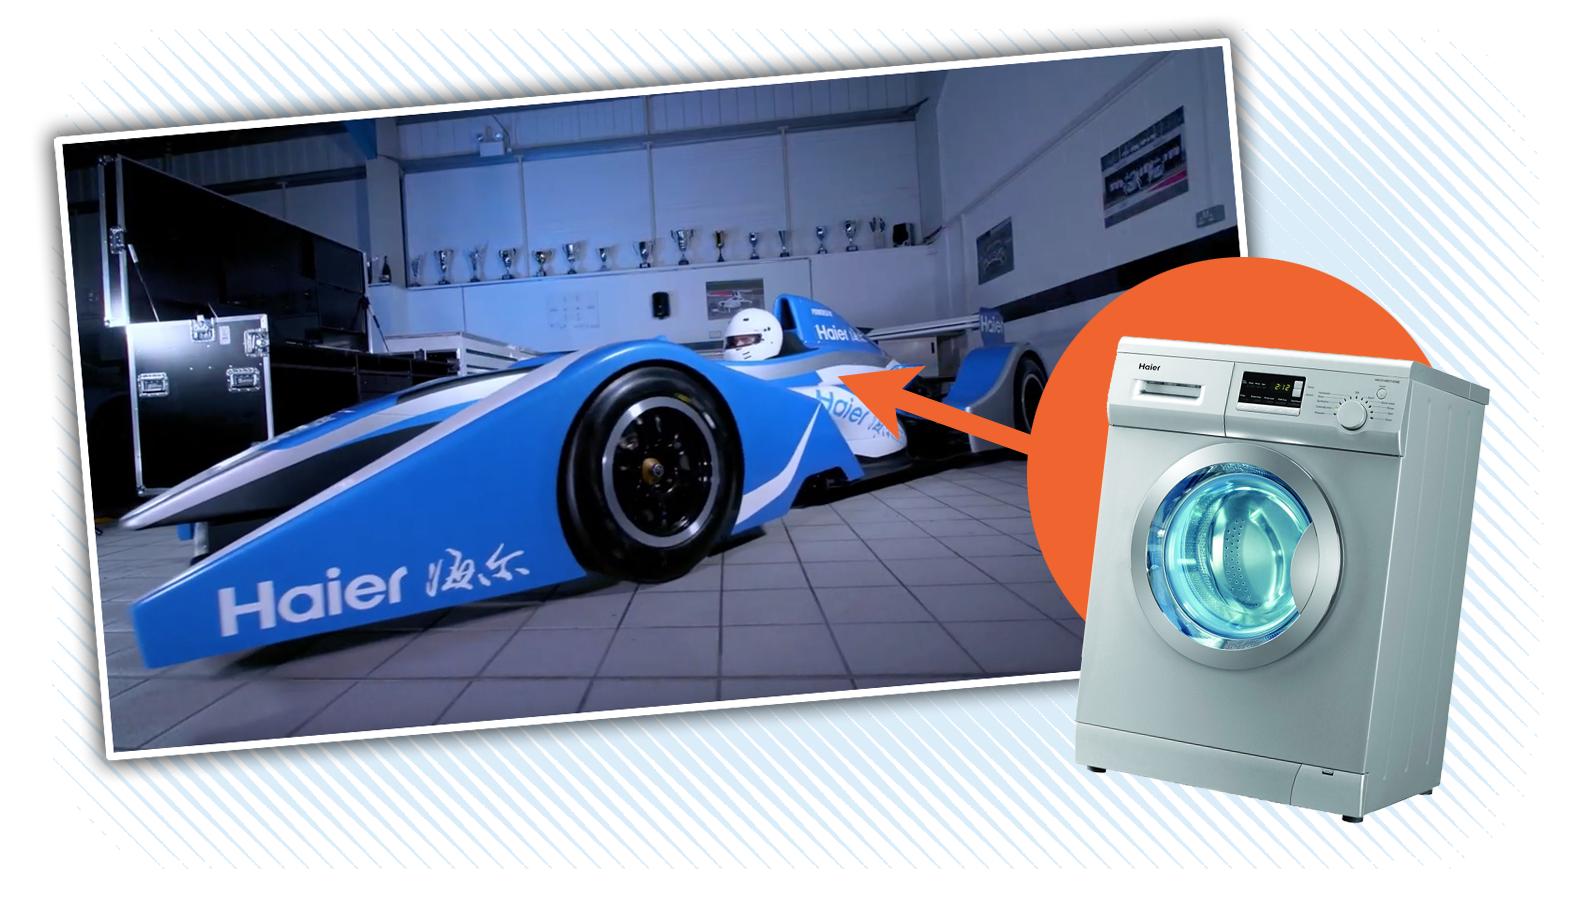 Global Racing Team Builds Formula Race Car With A Washing Machine Motor, Finally